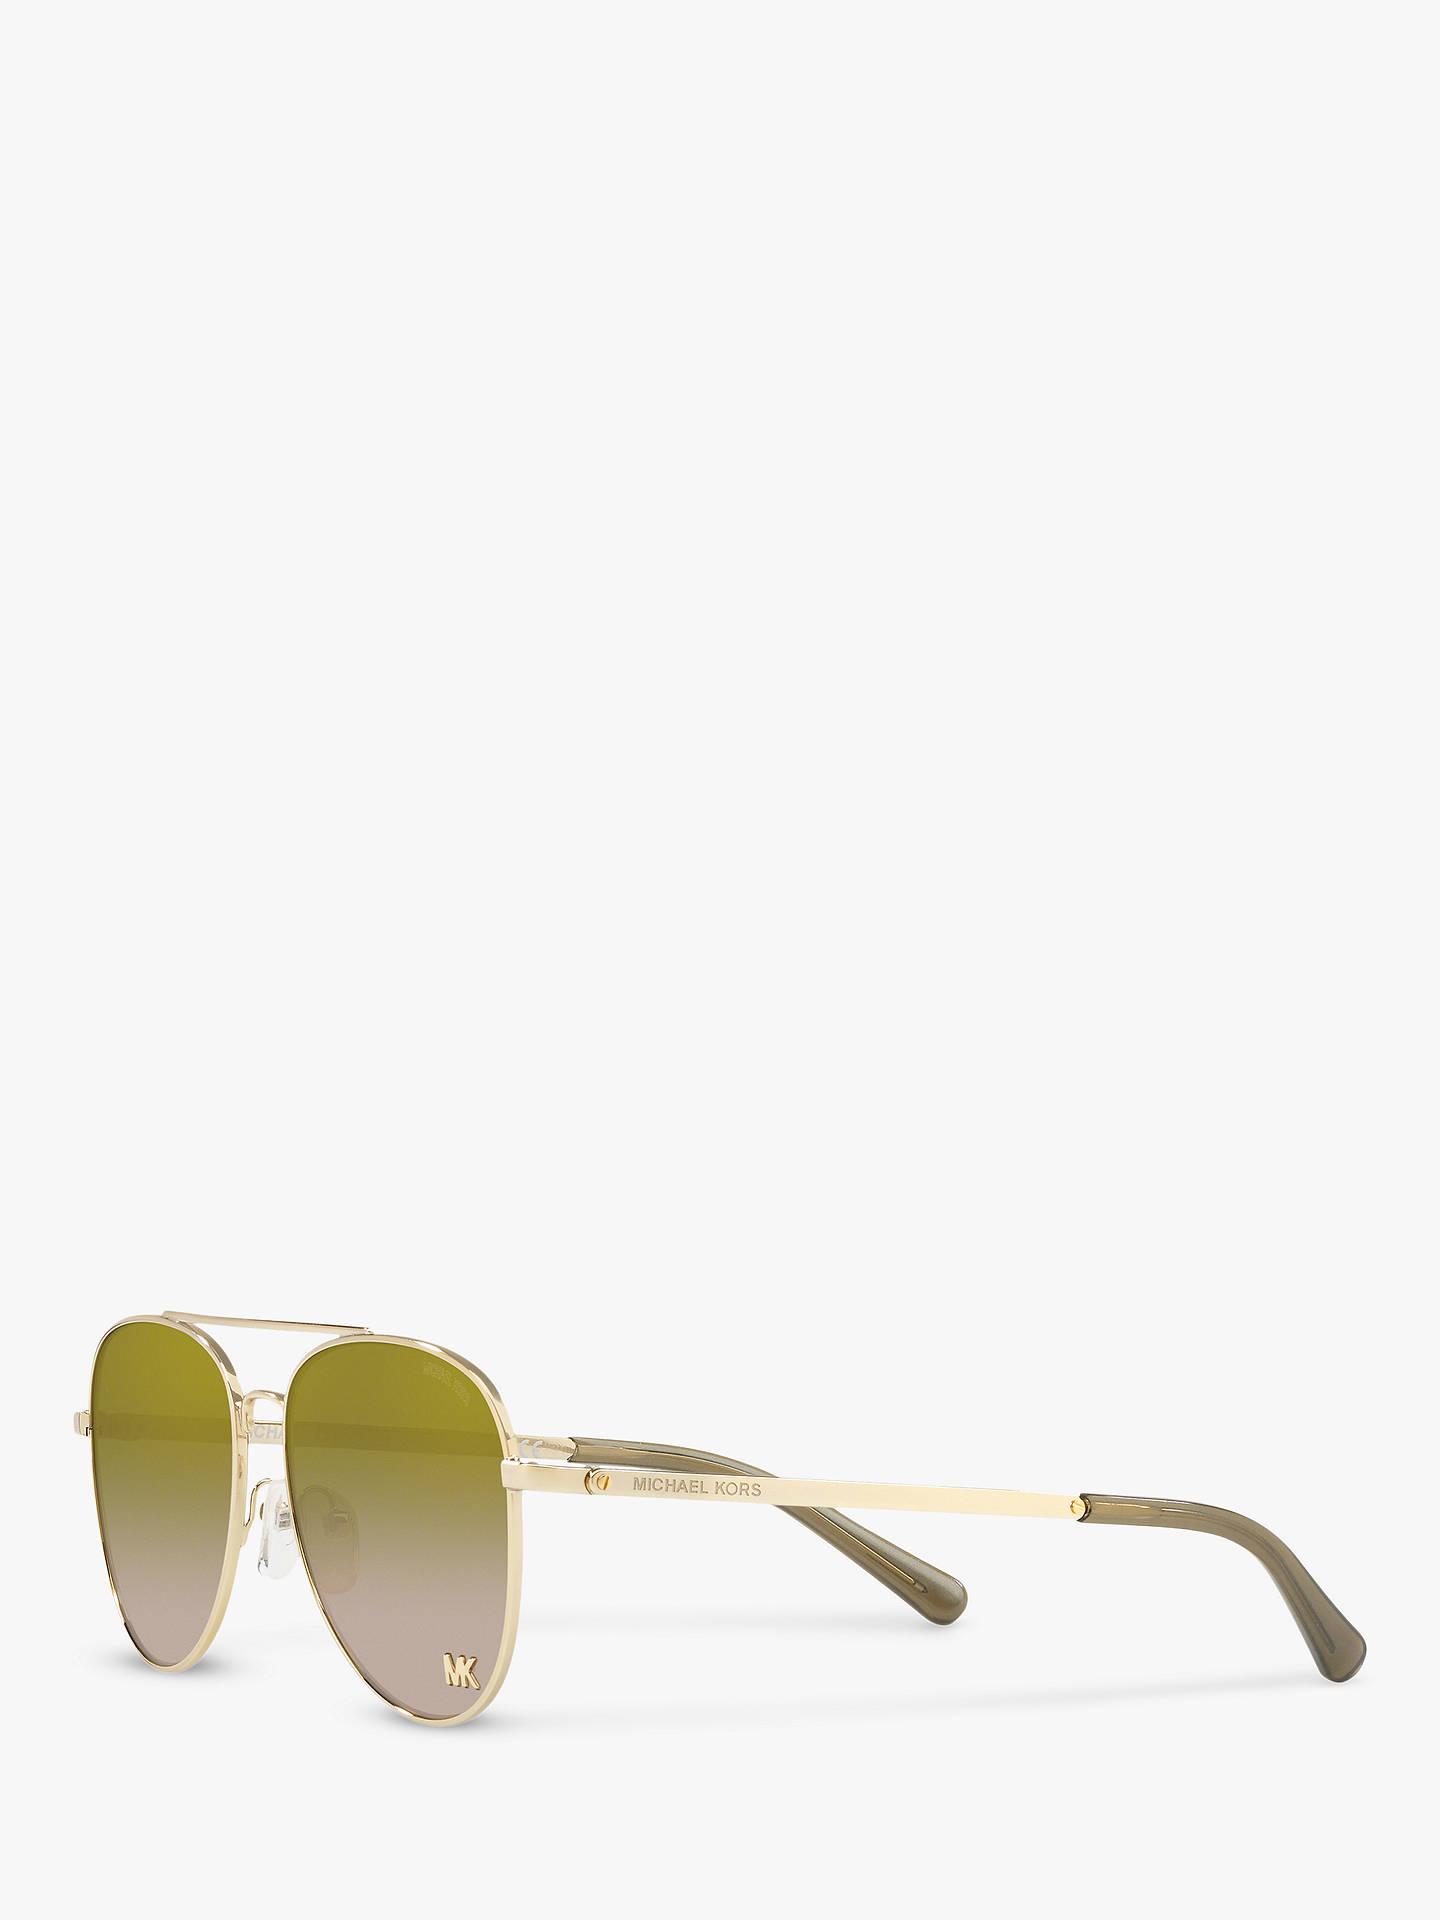 808ce1a66d77 Buy Michael Kors MK1045 Women s San Diego Aviator Sunglasses